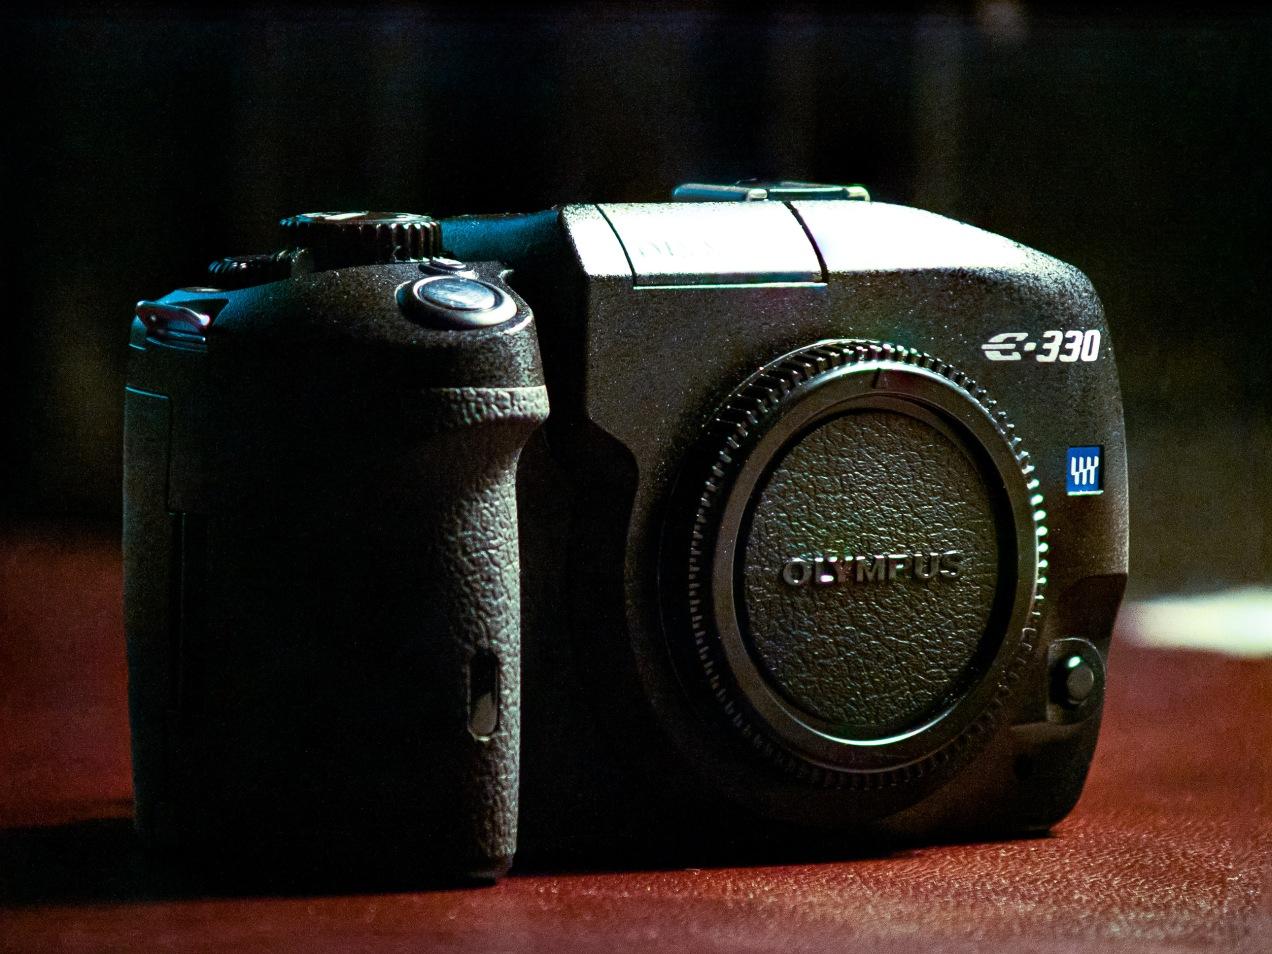 Olympus E-330 DSLR